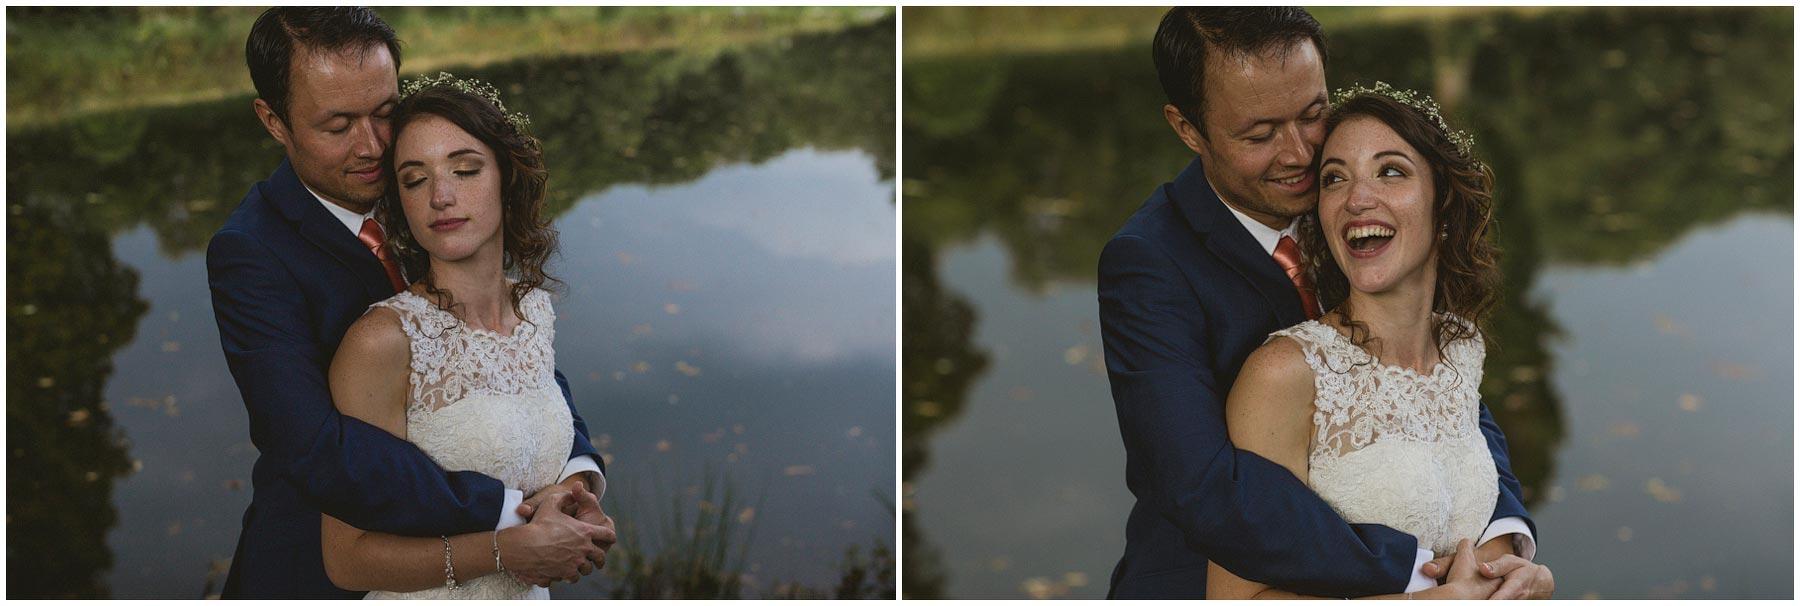 Colehayes-Park-Wedding-Photography_0127